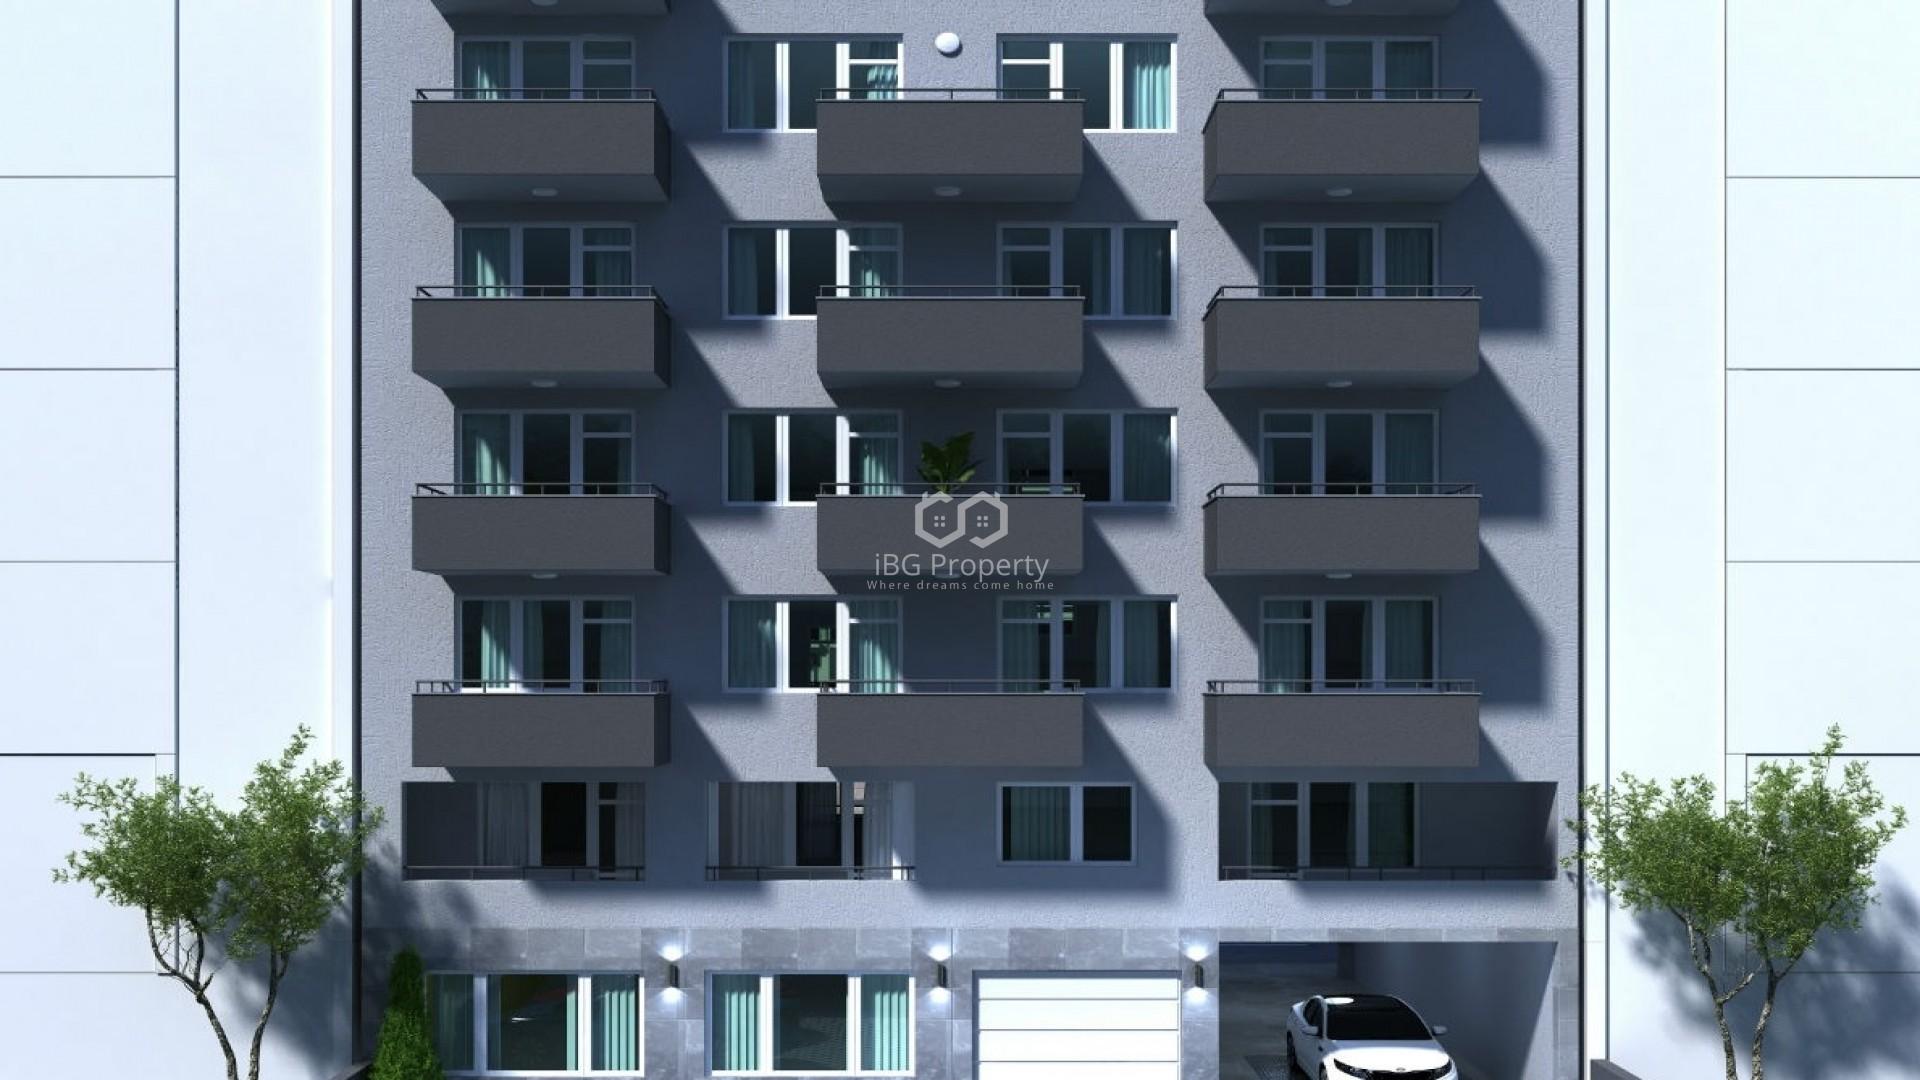 Тристаен апартамент Колхозен пазар Варна 108 m2